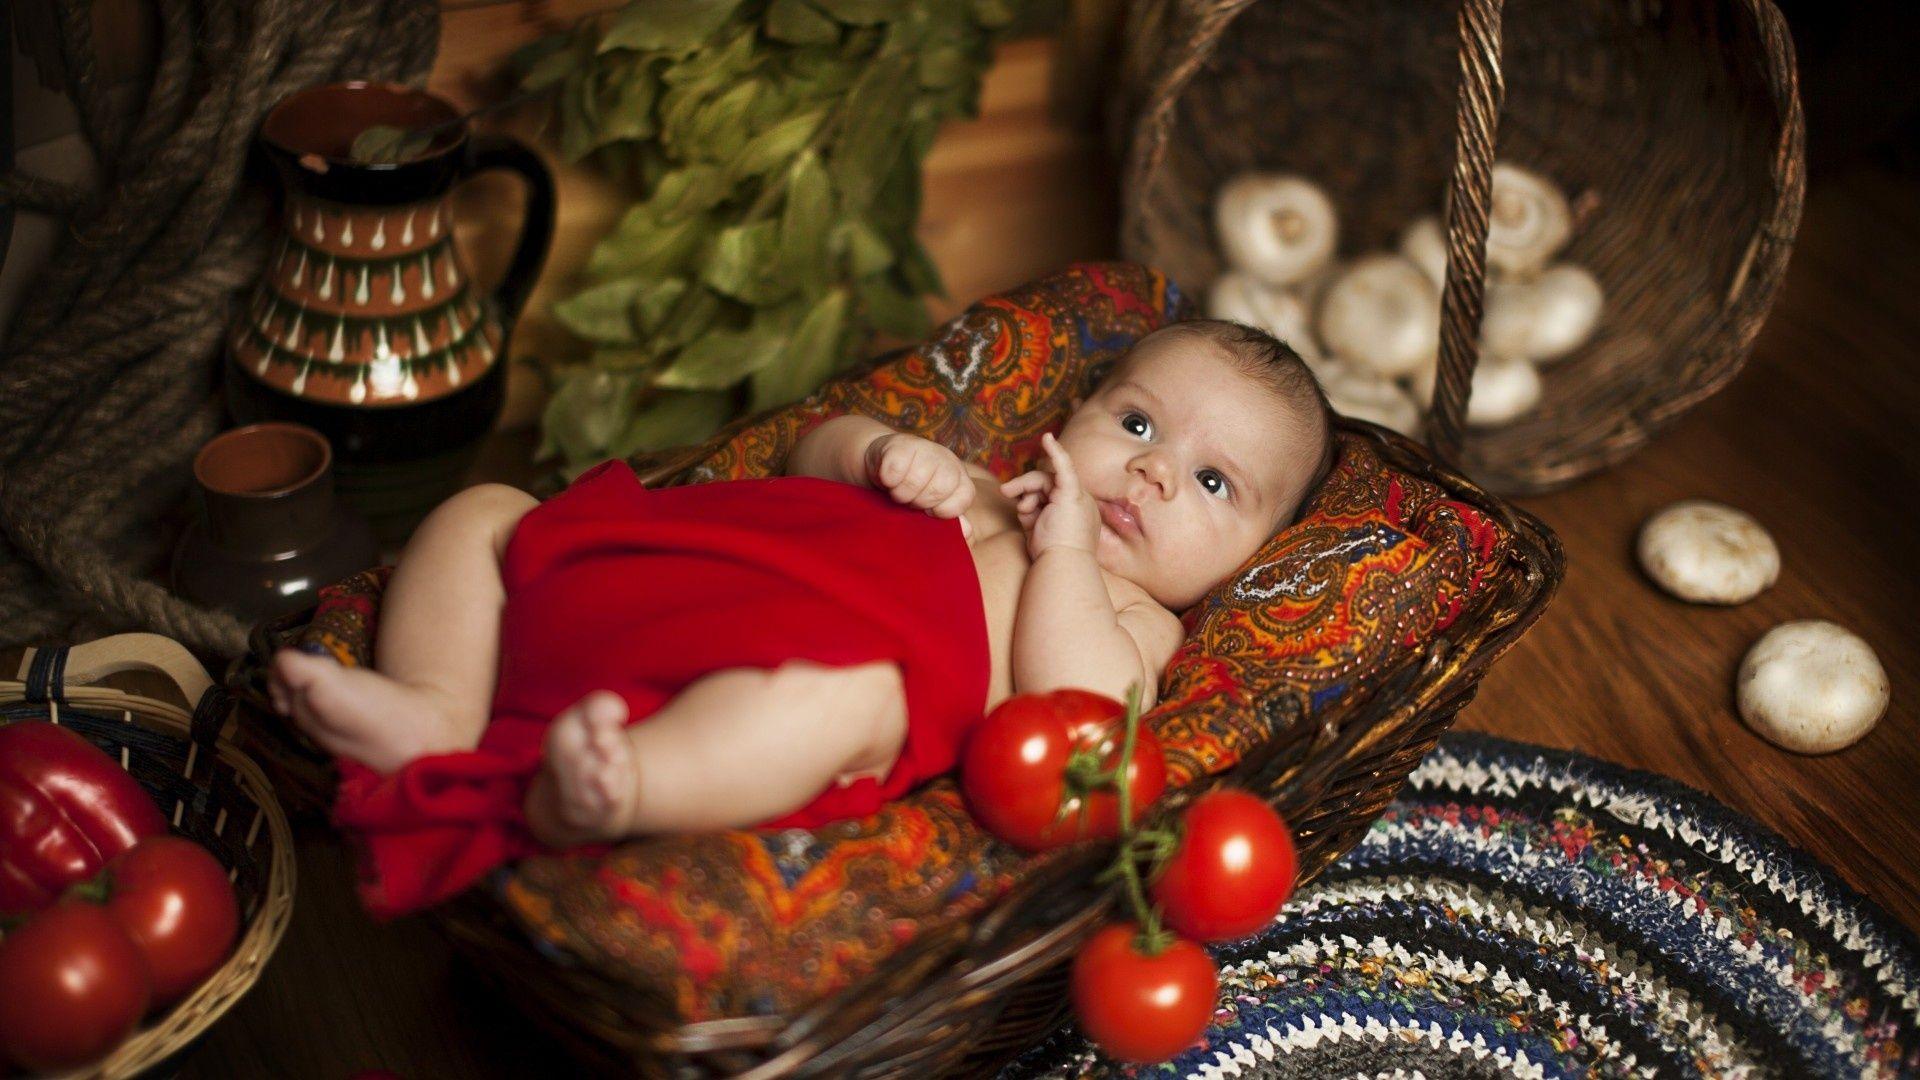 Cute baby Cute Baby Wallpapers Pinterest